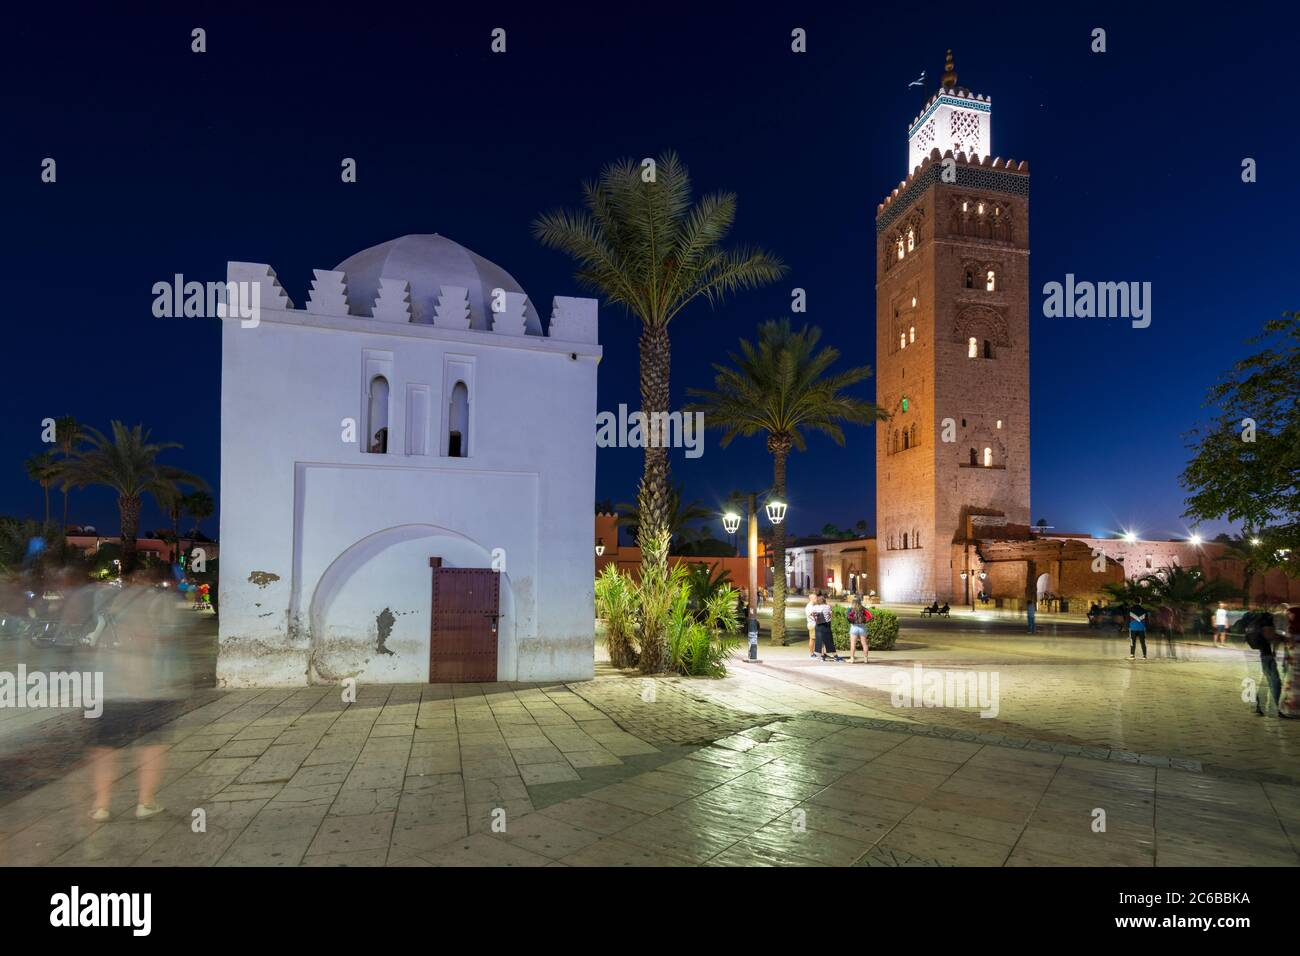 Mezquita Koutoubia, Sitio del Patrimonio Mundial de la UNESCO, Marrakech (Marrakech), Marruecos, Norte de África, África Foto de stock